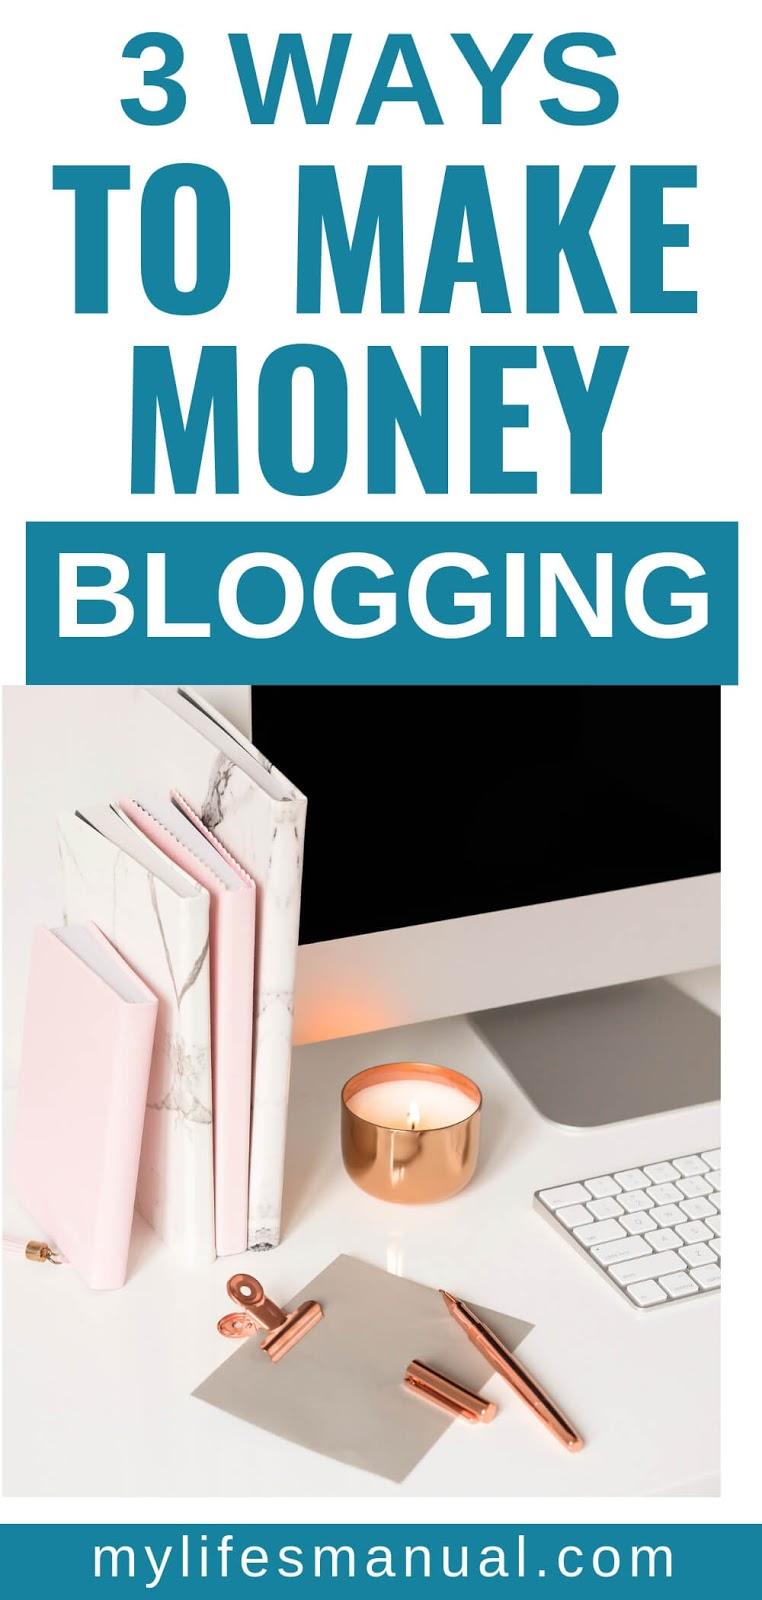 Smart ways to monetize a blog